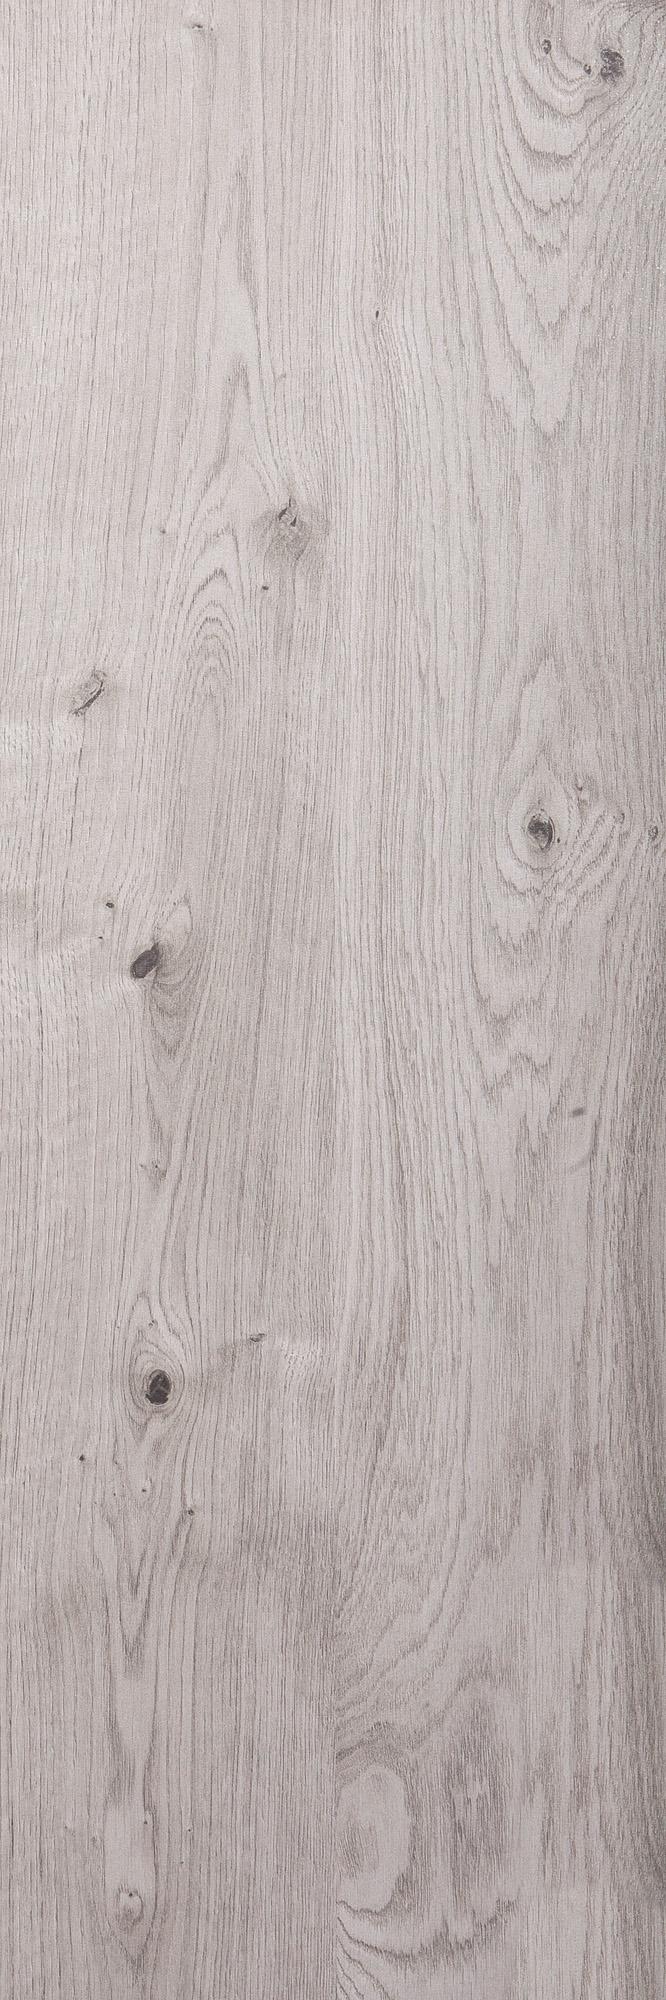 Chêne gris perlé